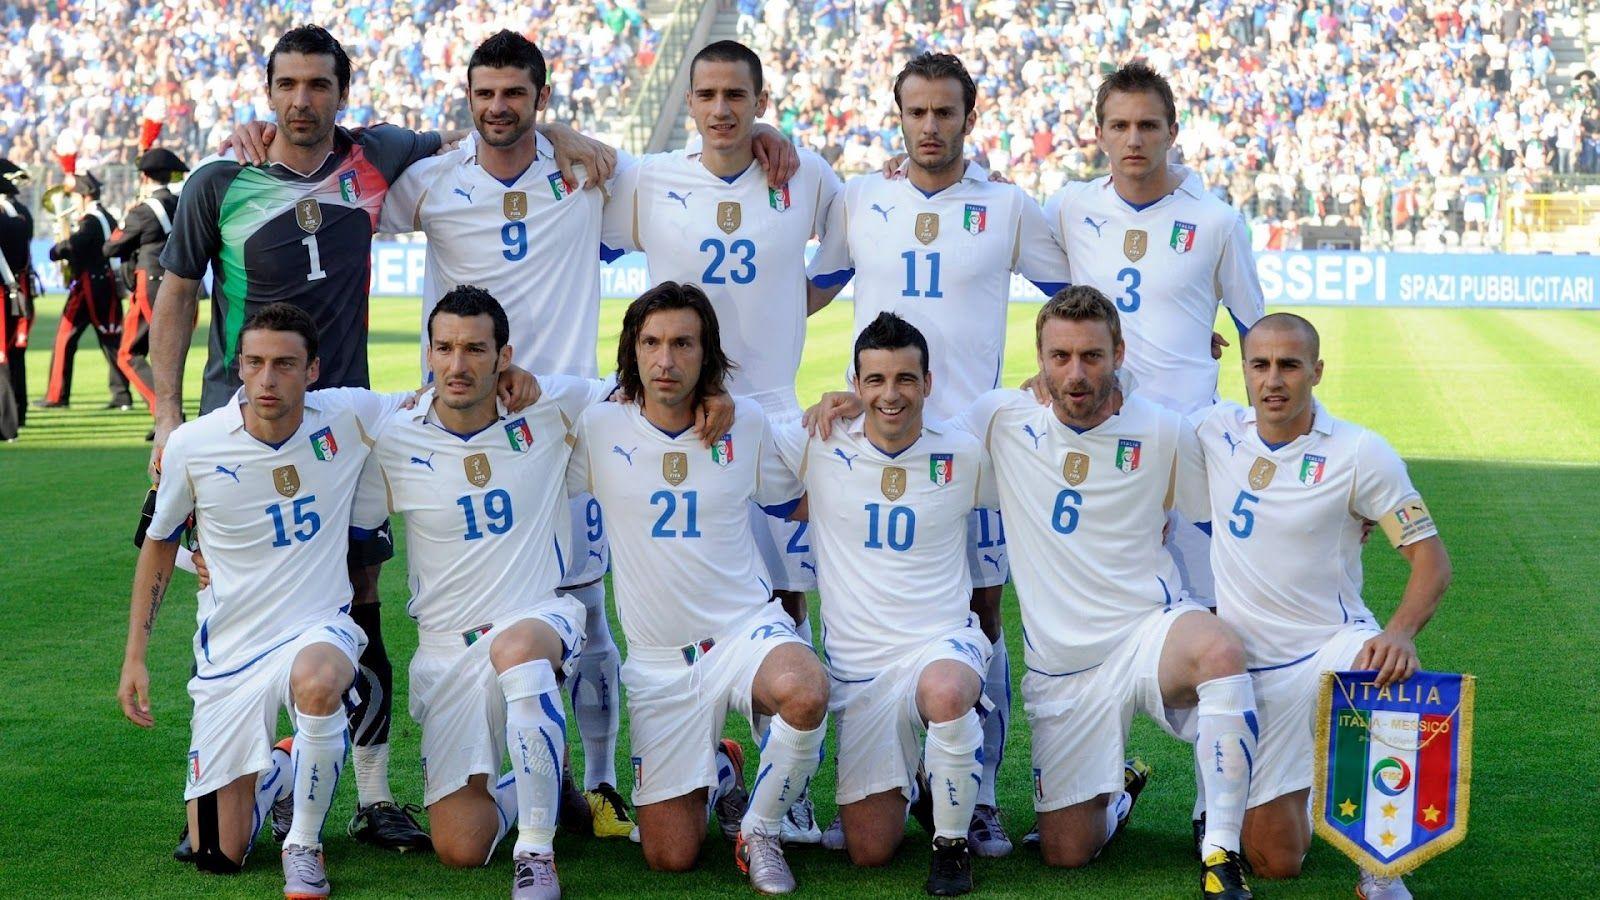 Italy National Soccer Team Mystery Wallpaper Italy National Football Team Italian Soccer Team Italy Team